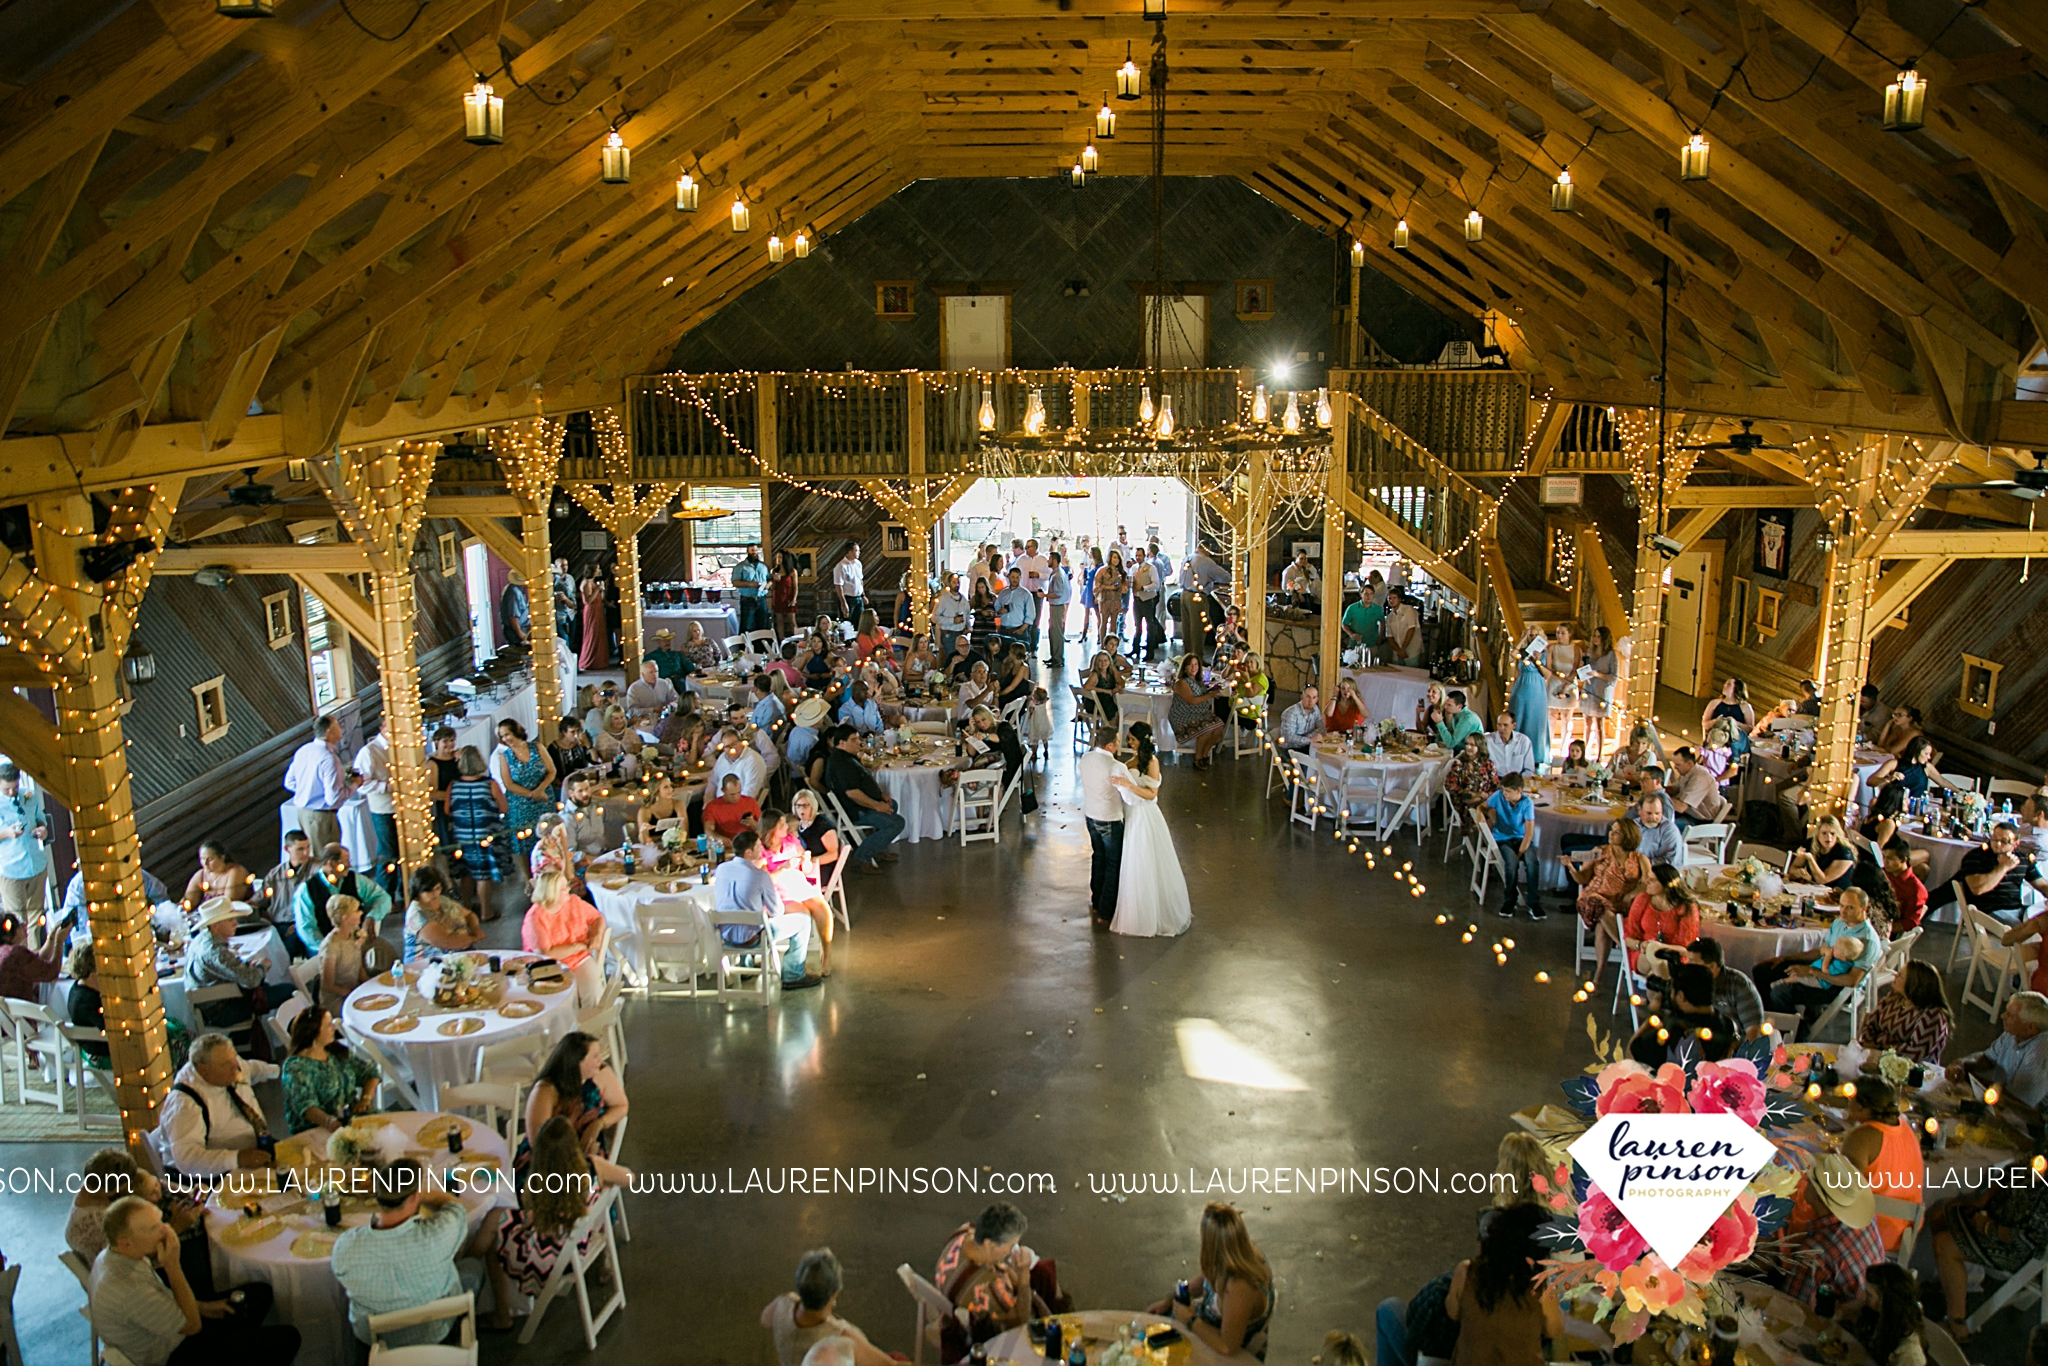 jones-barn-willow-creek-ranch-wedding-in-cleburne-texas-fort-worth-dfw-wichita-falls-wedding-photography_3255.jpg